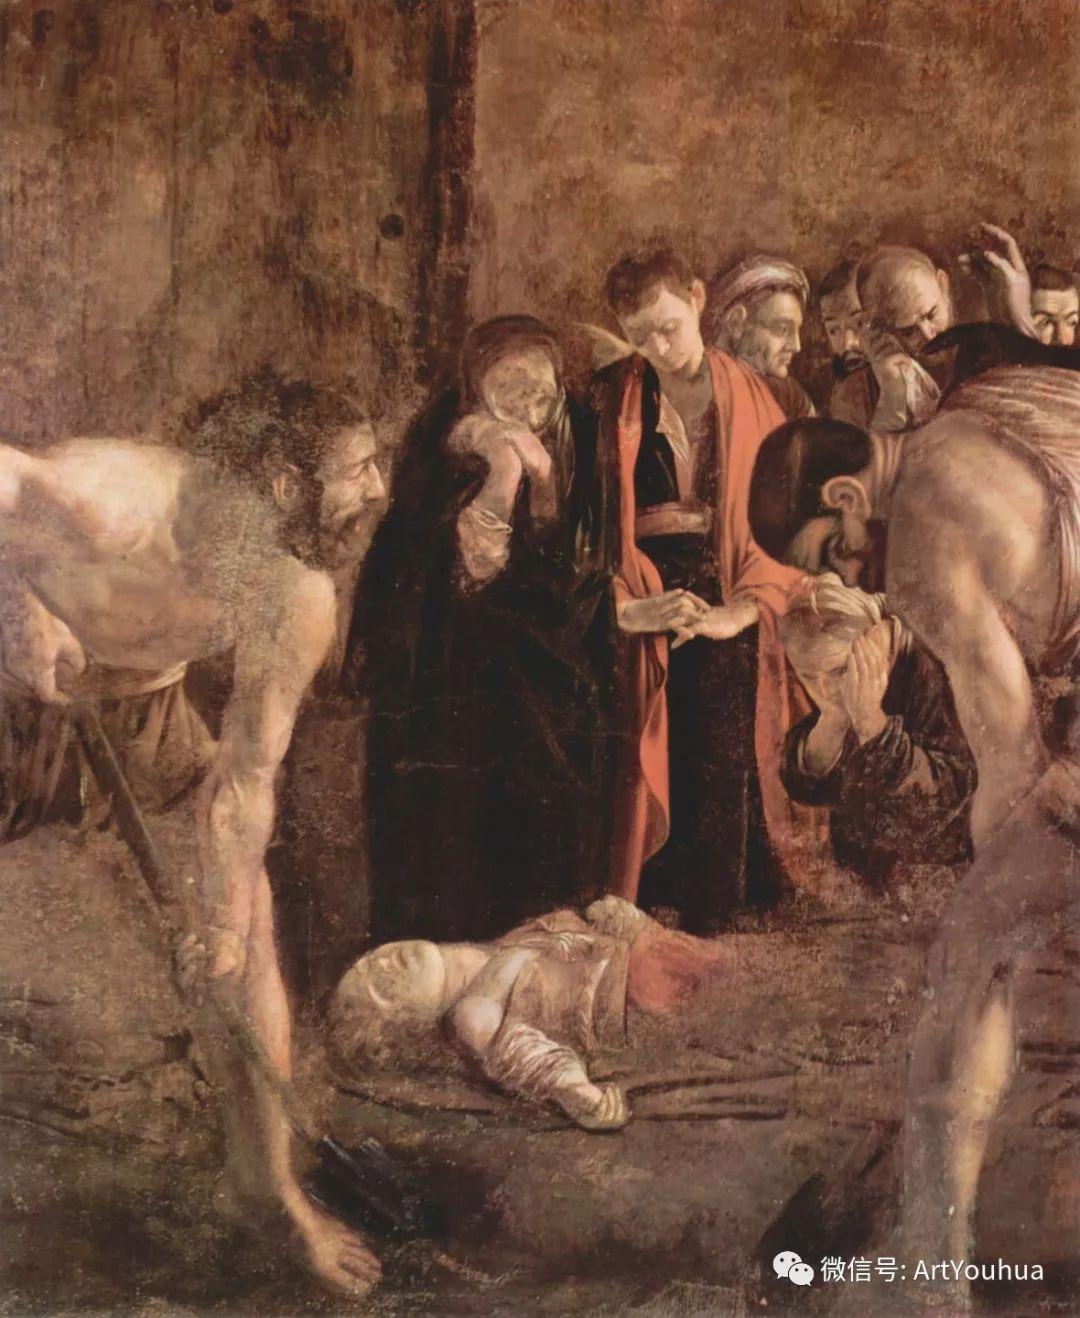 No.18 卡拉瓦乔 | 意大利16世纪末至17世纪初的著名画家插图131